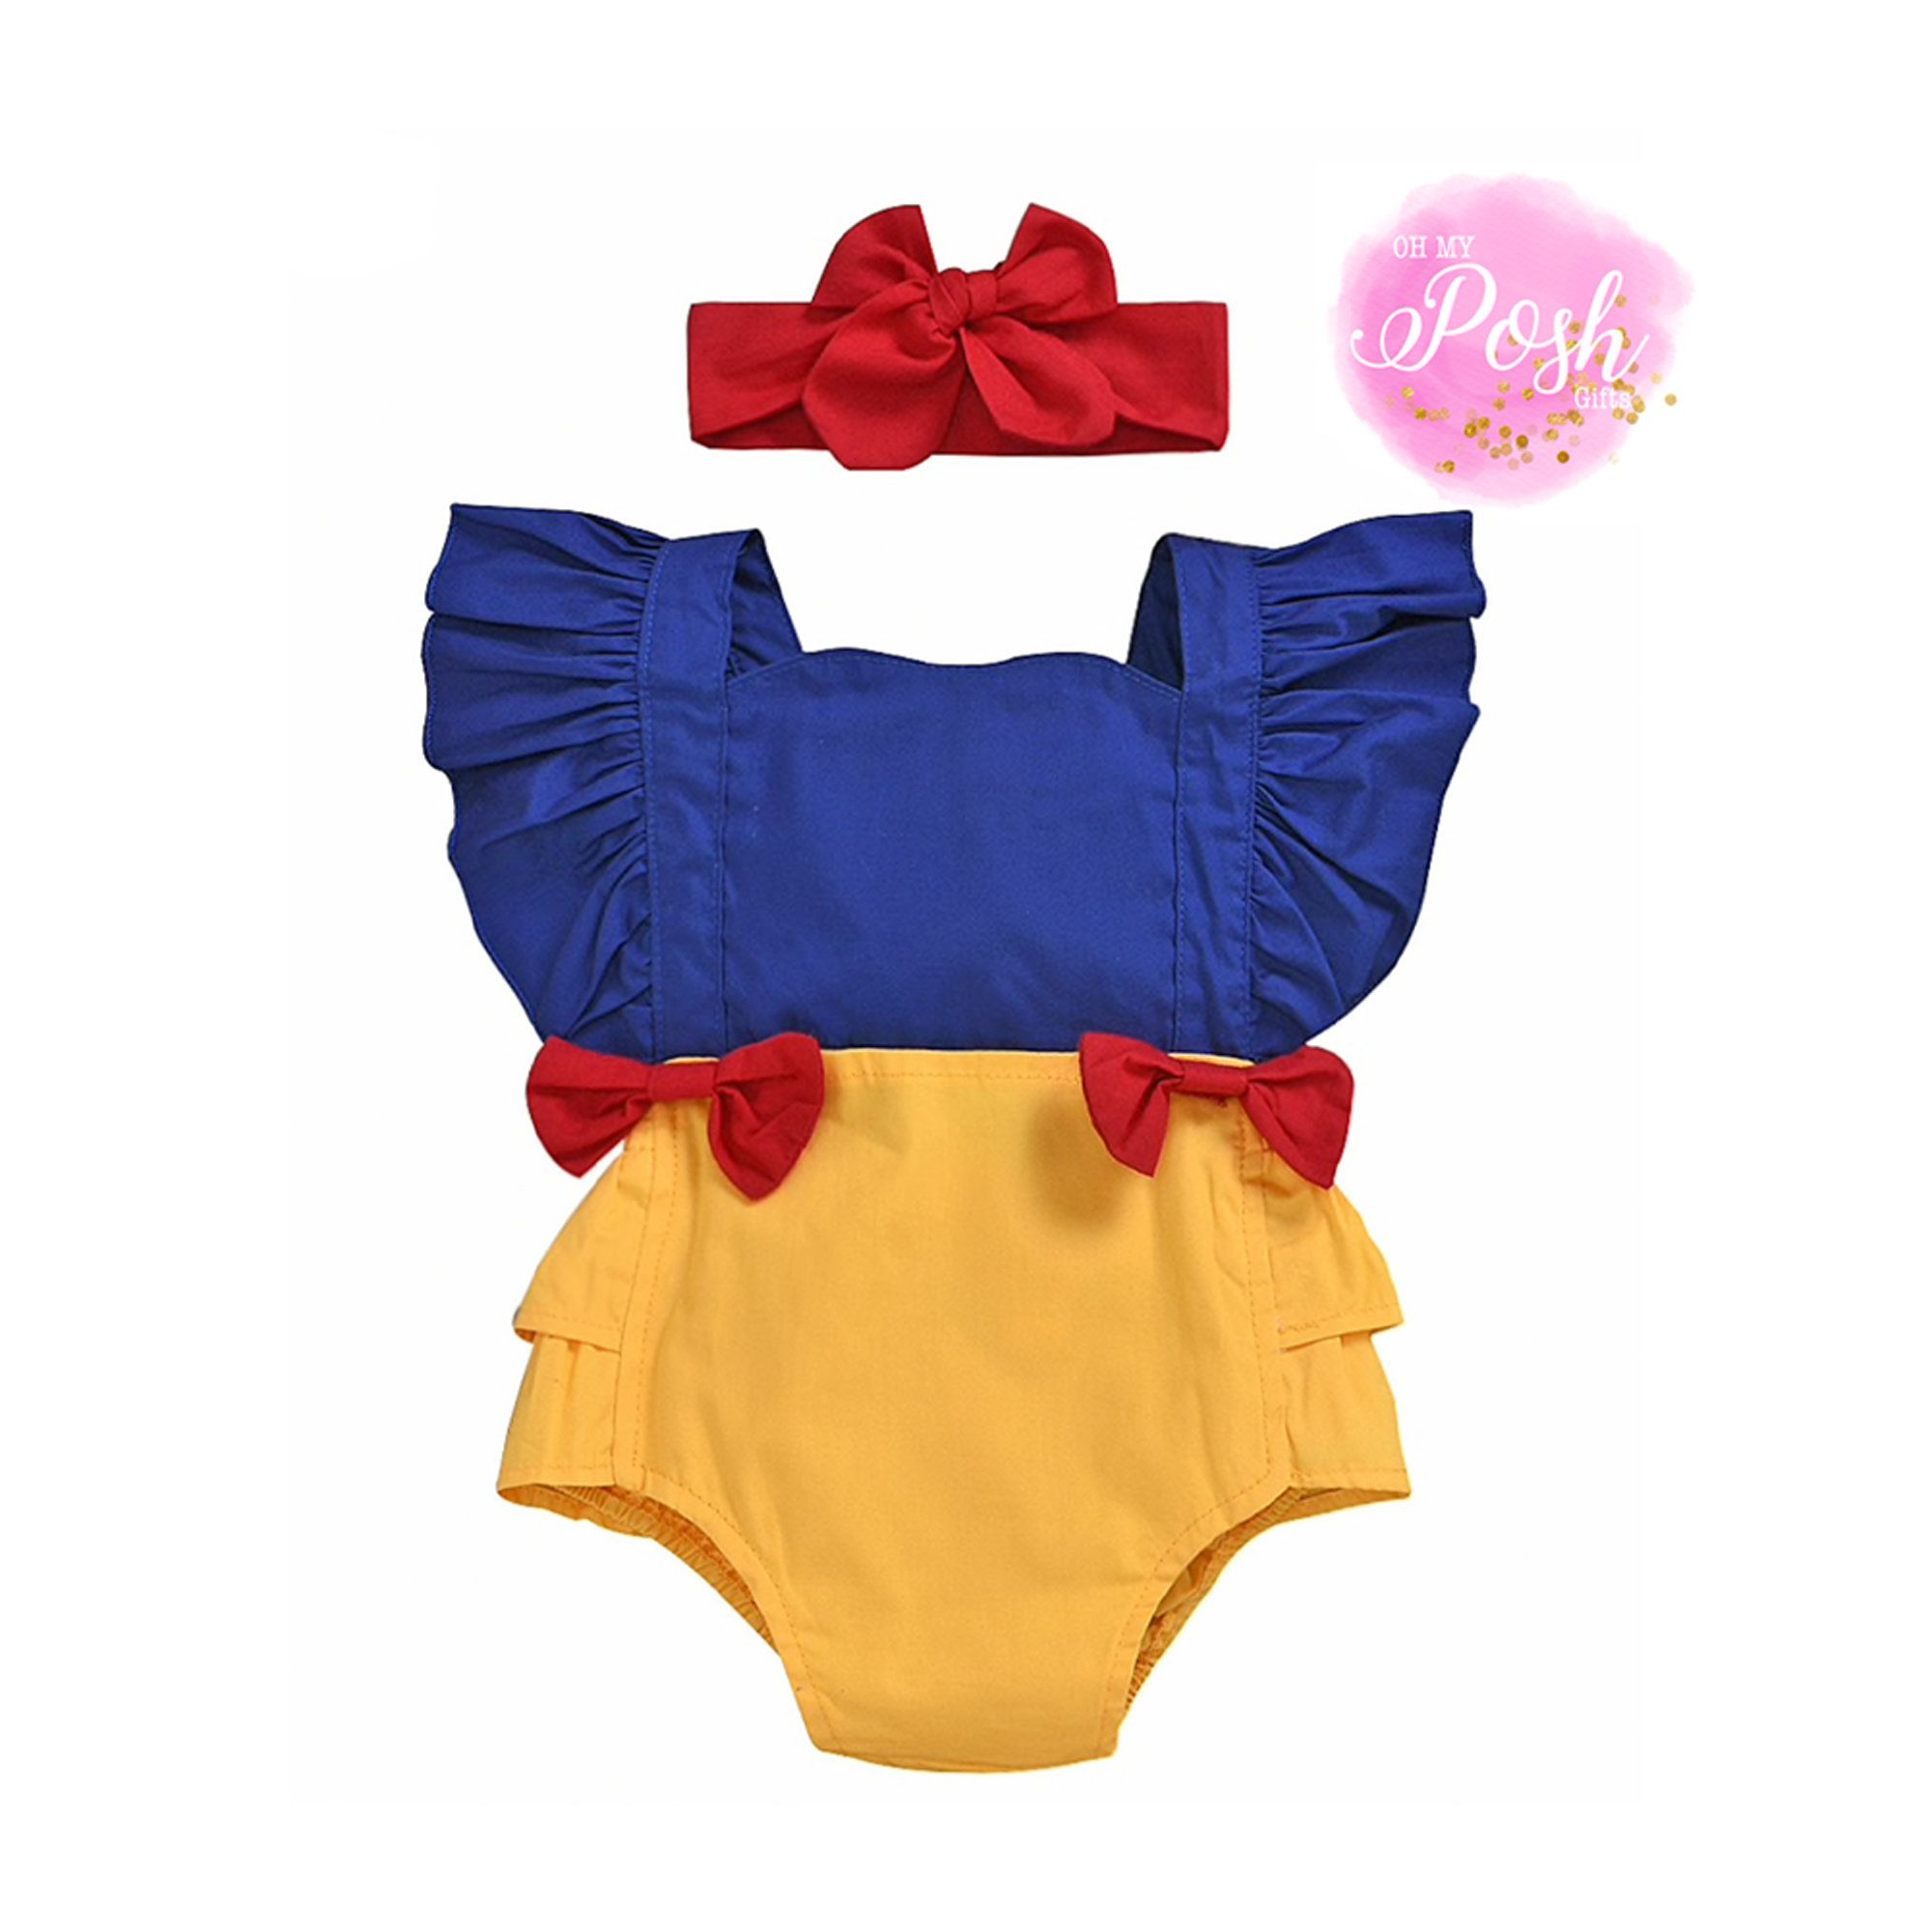 Newborn Snow White and the Seven Dwarfs romper Baby Lock mameluk bodysuit Snow White Baby Romper